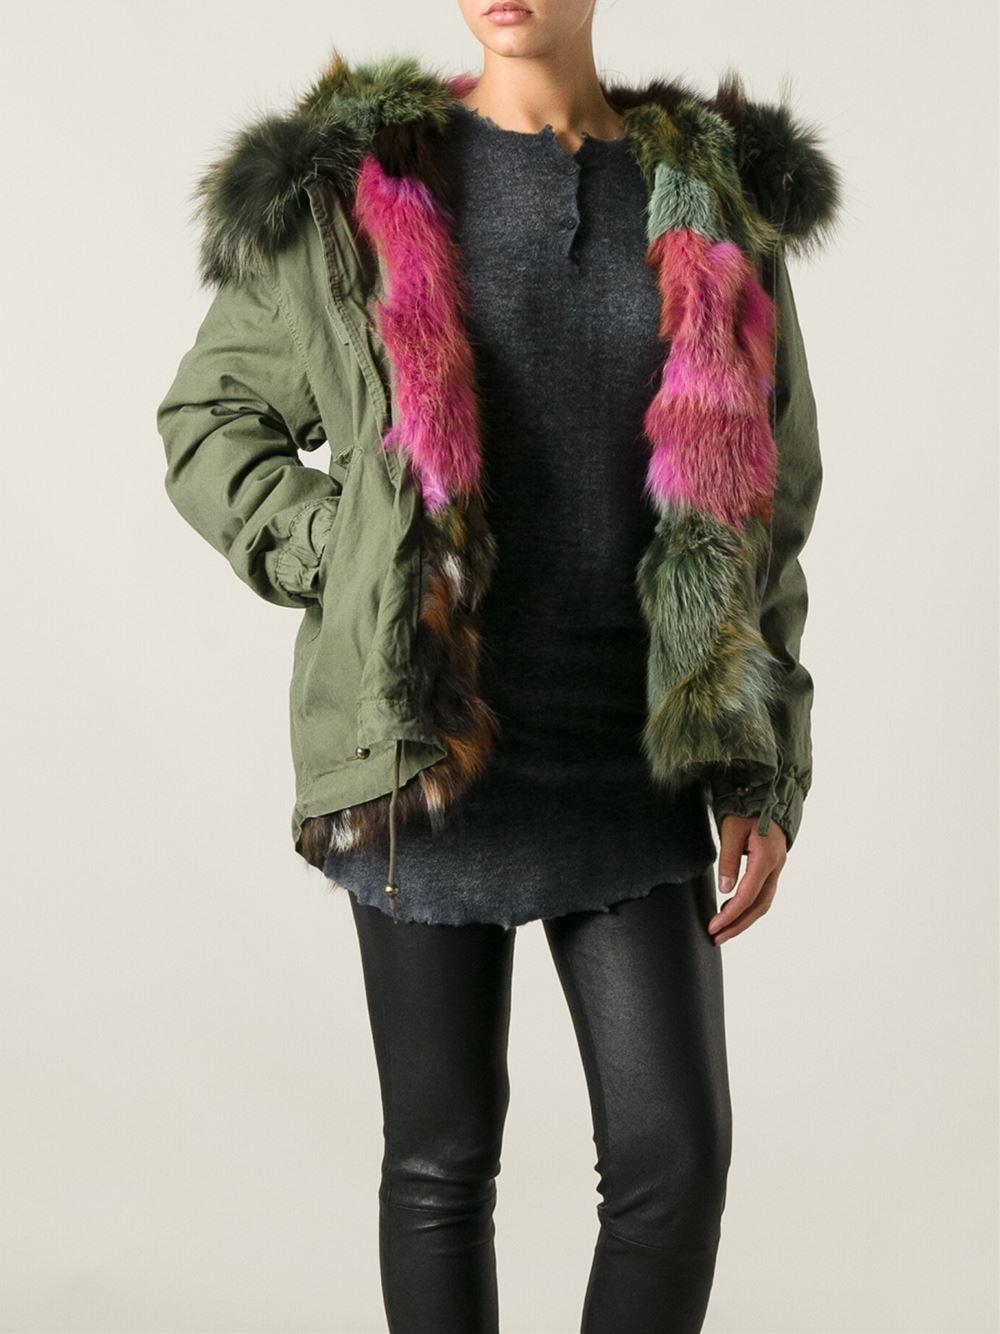 Mr & mrs italy Fur Trim Parka Coat in Green